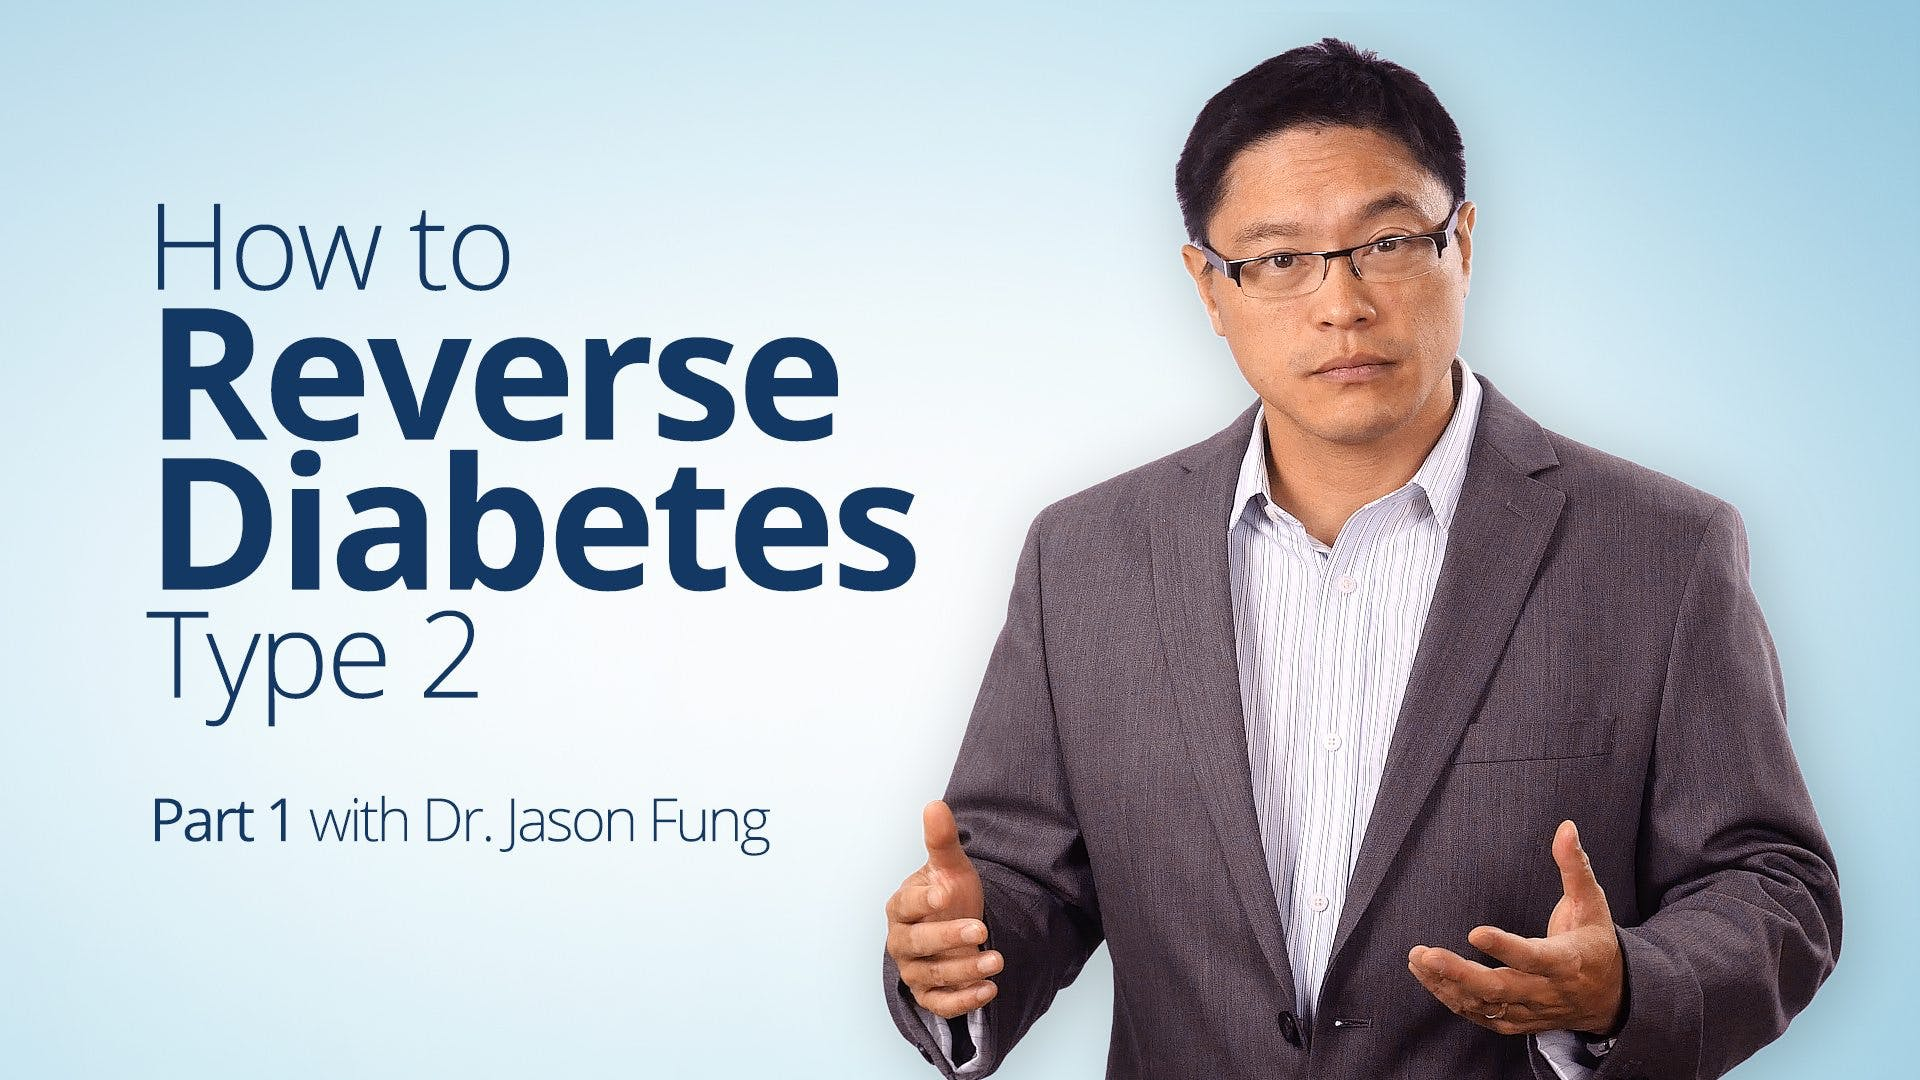 How to reverse diabetes type 2